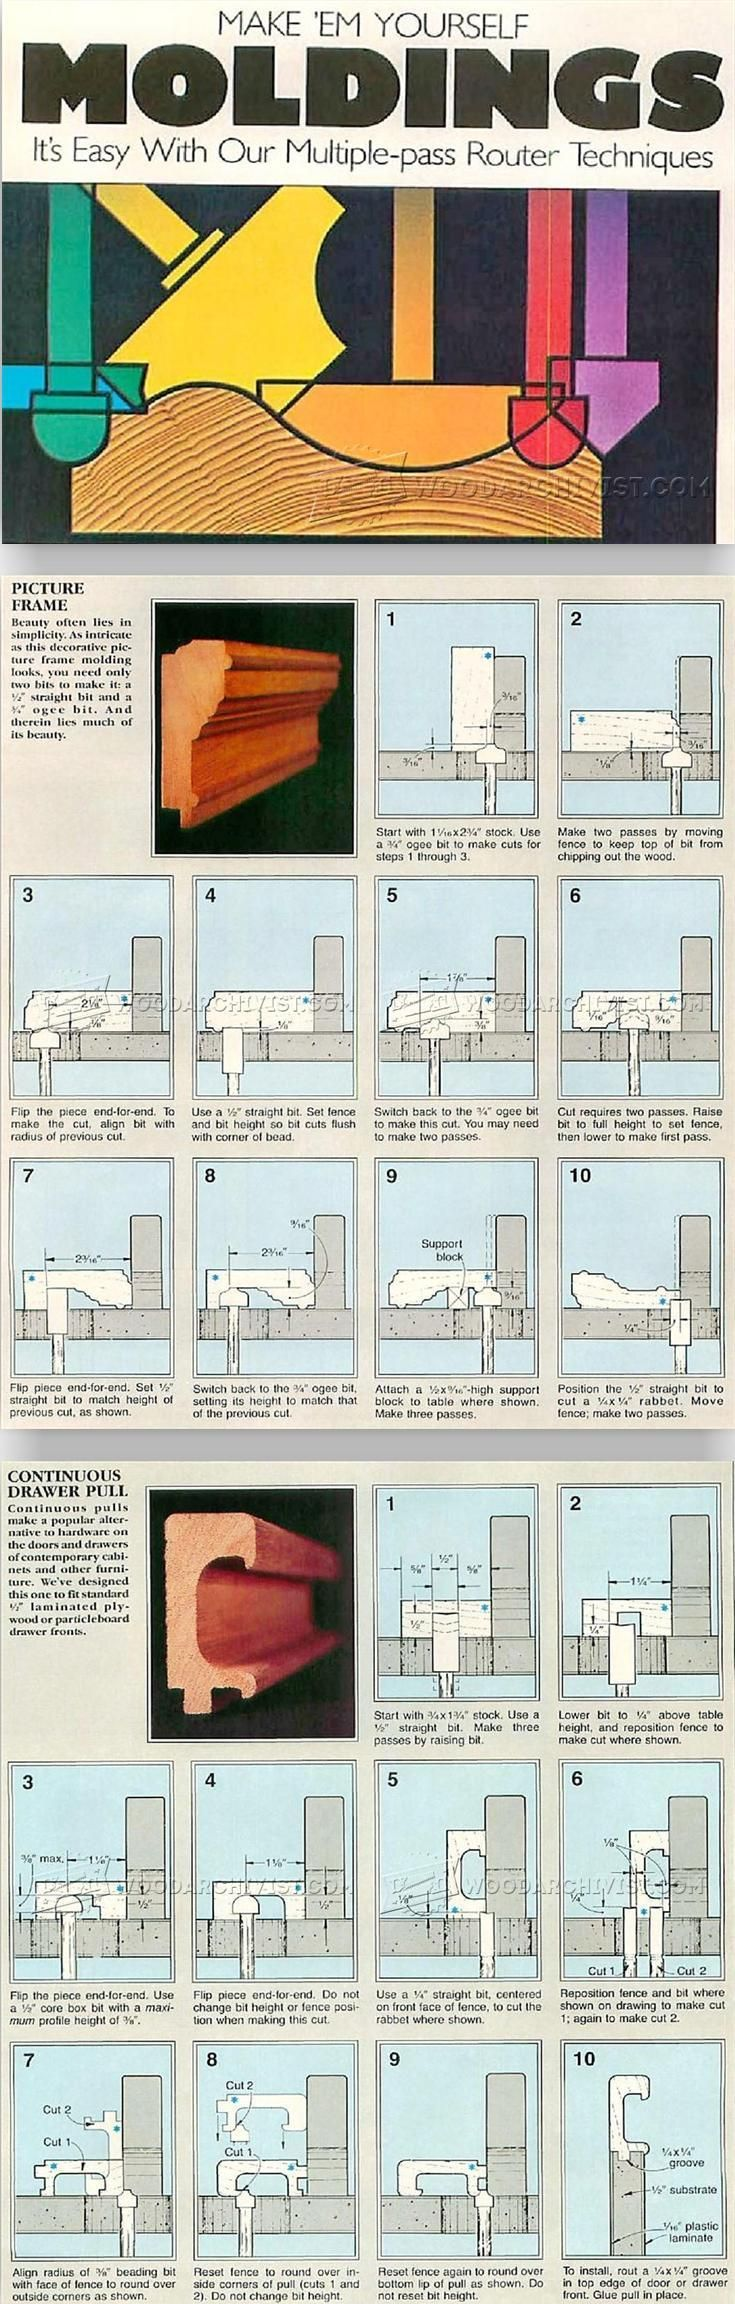 Create Molding With a Router - Furniture Molding Construction Techniques | WoodArchivist.com